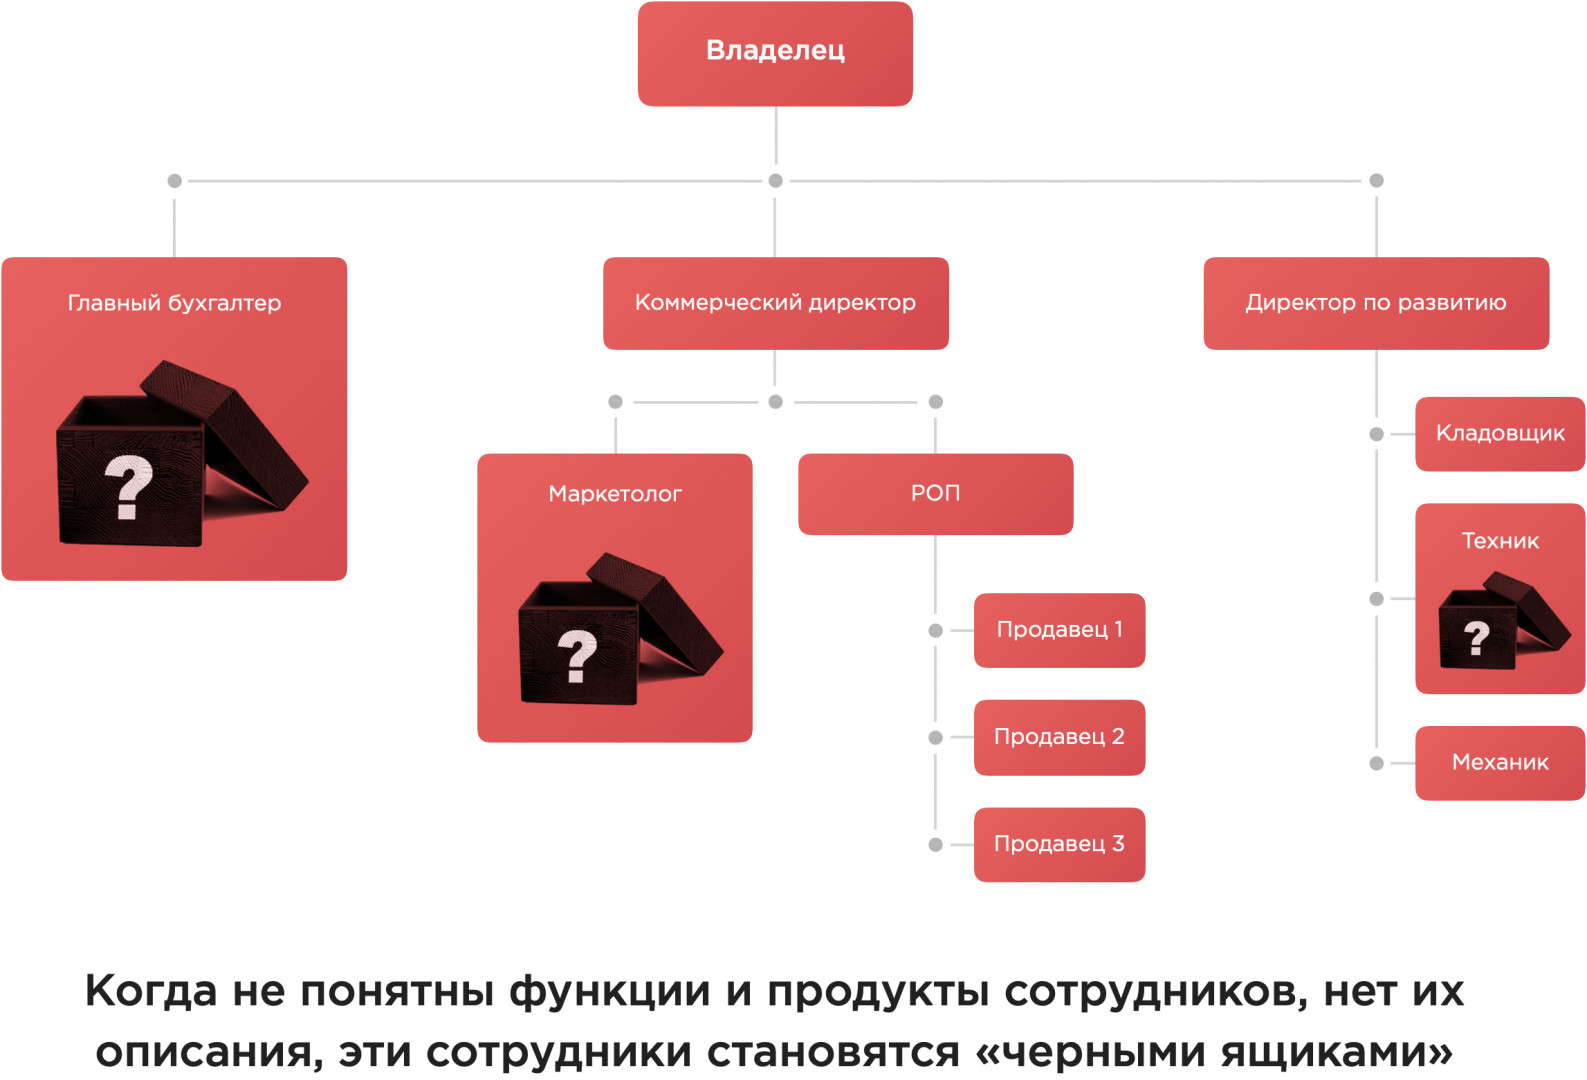 image 62.jpg